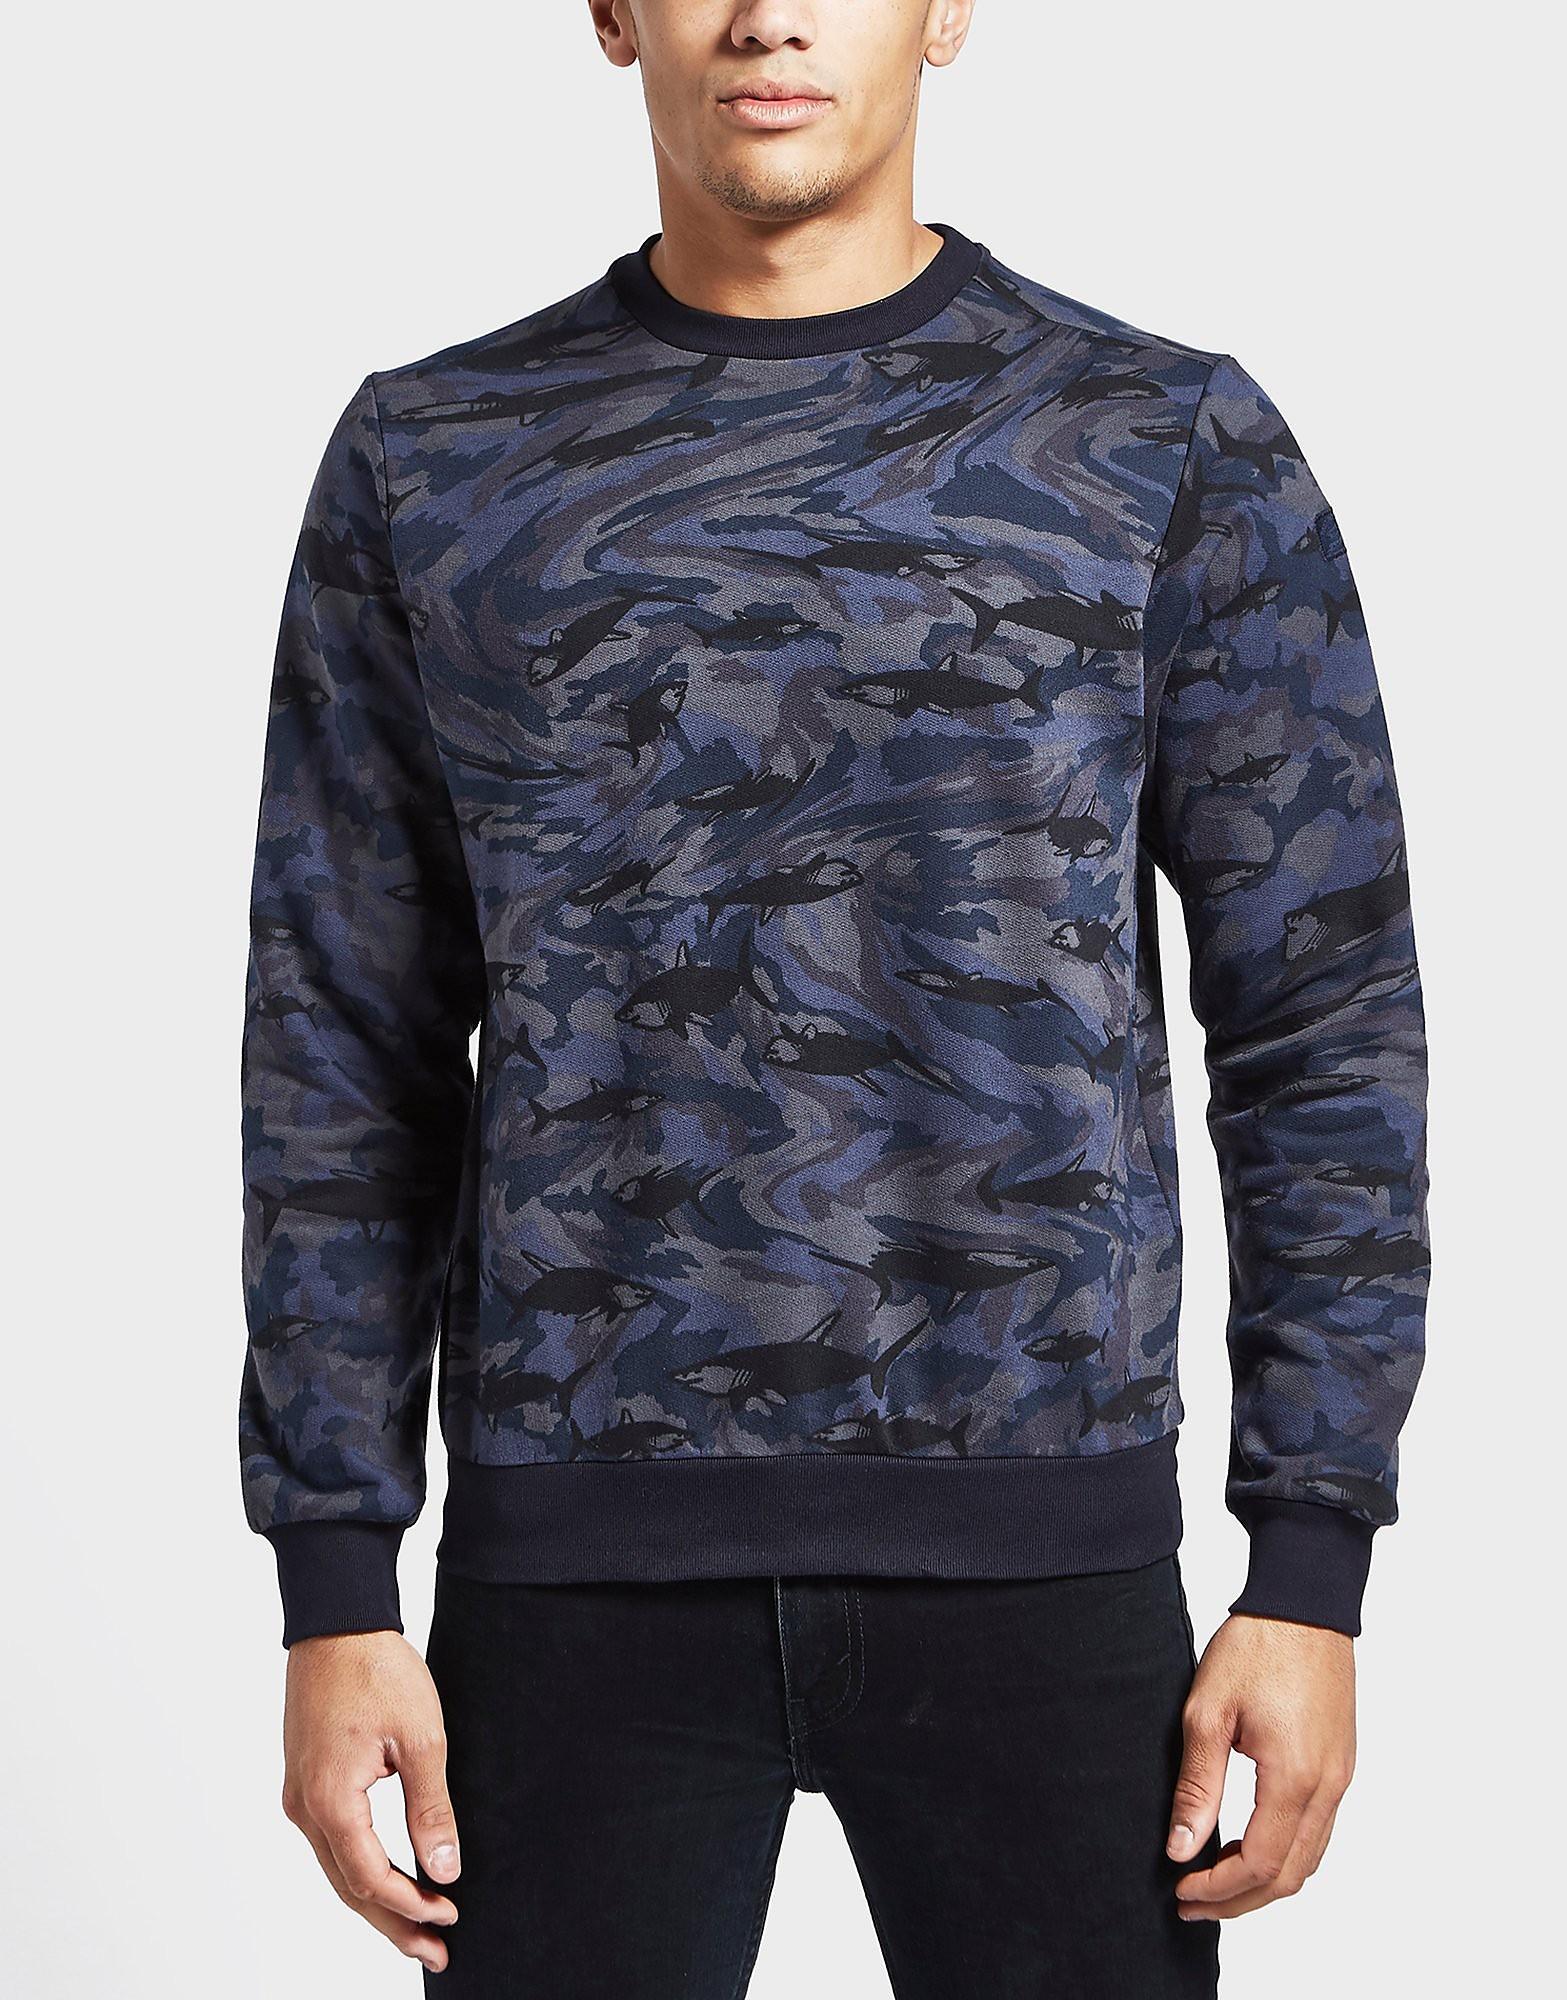 Paul and Shark Camoflauge Shark Sweatshirt